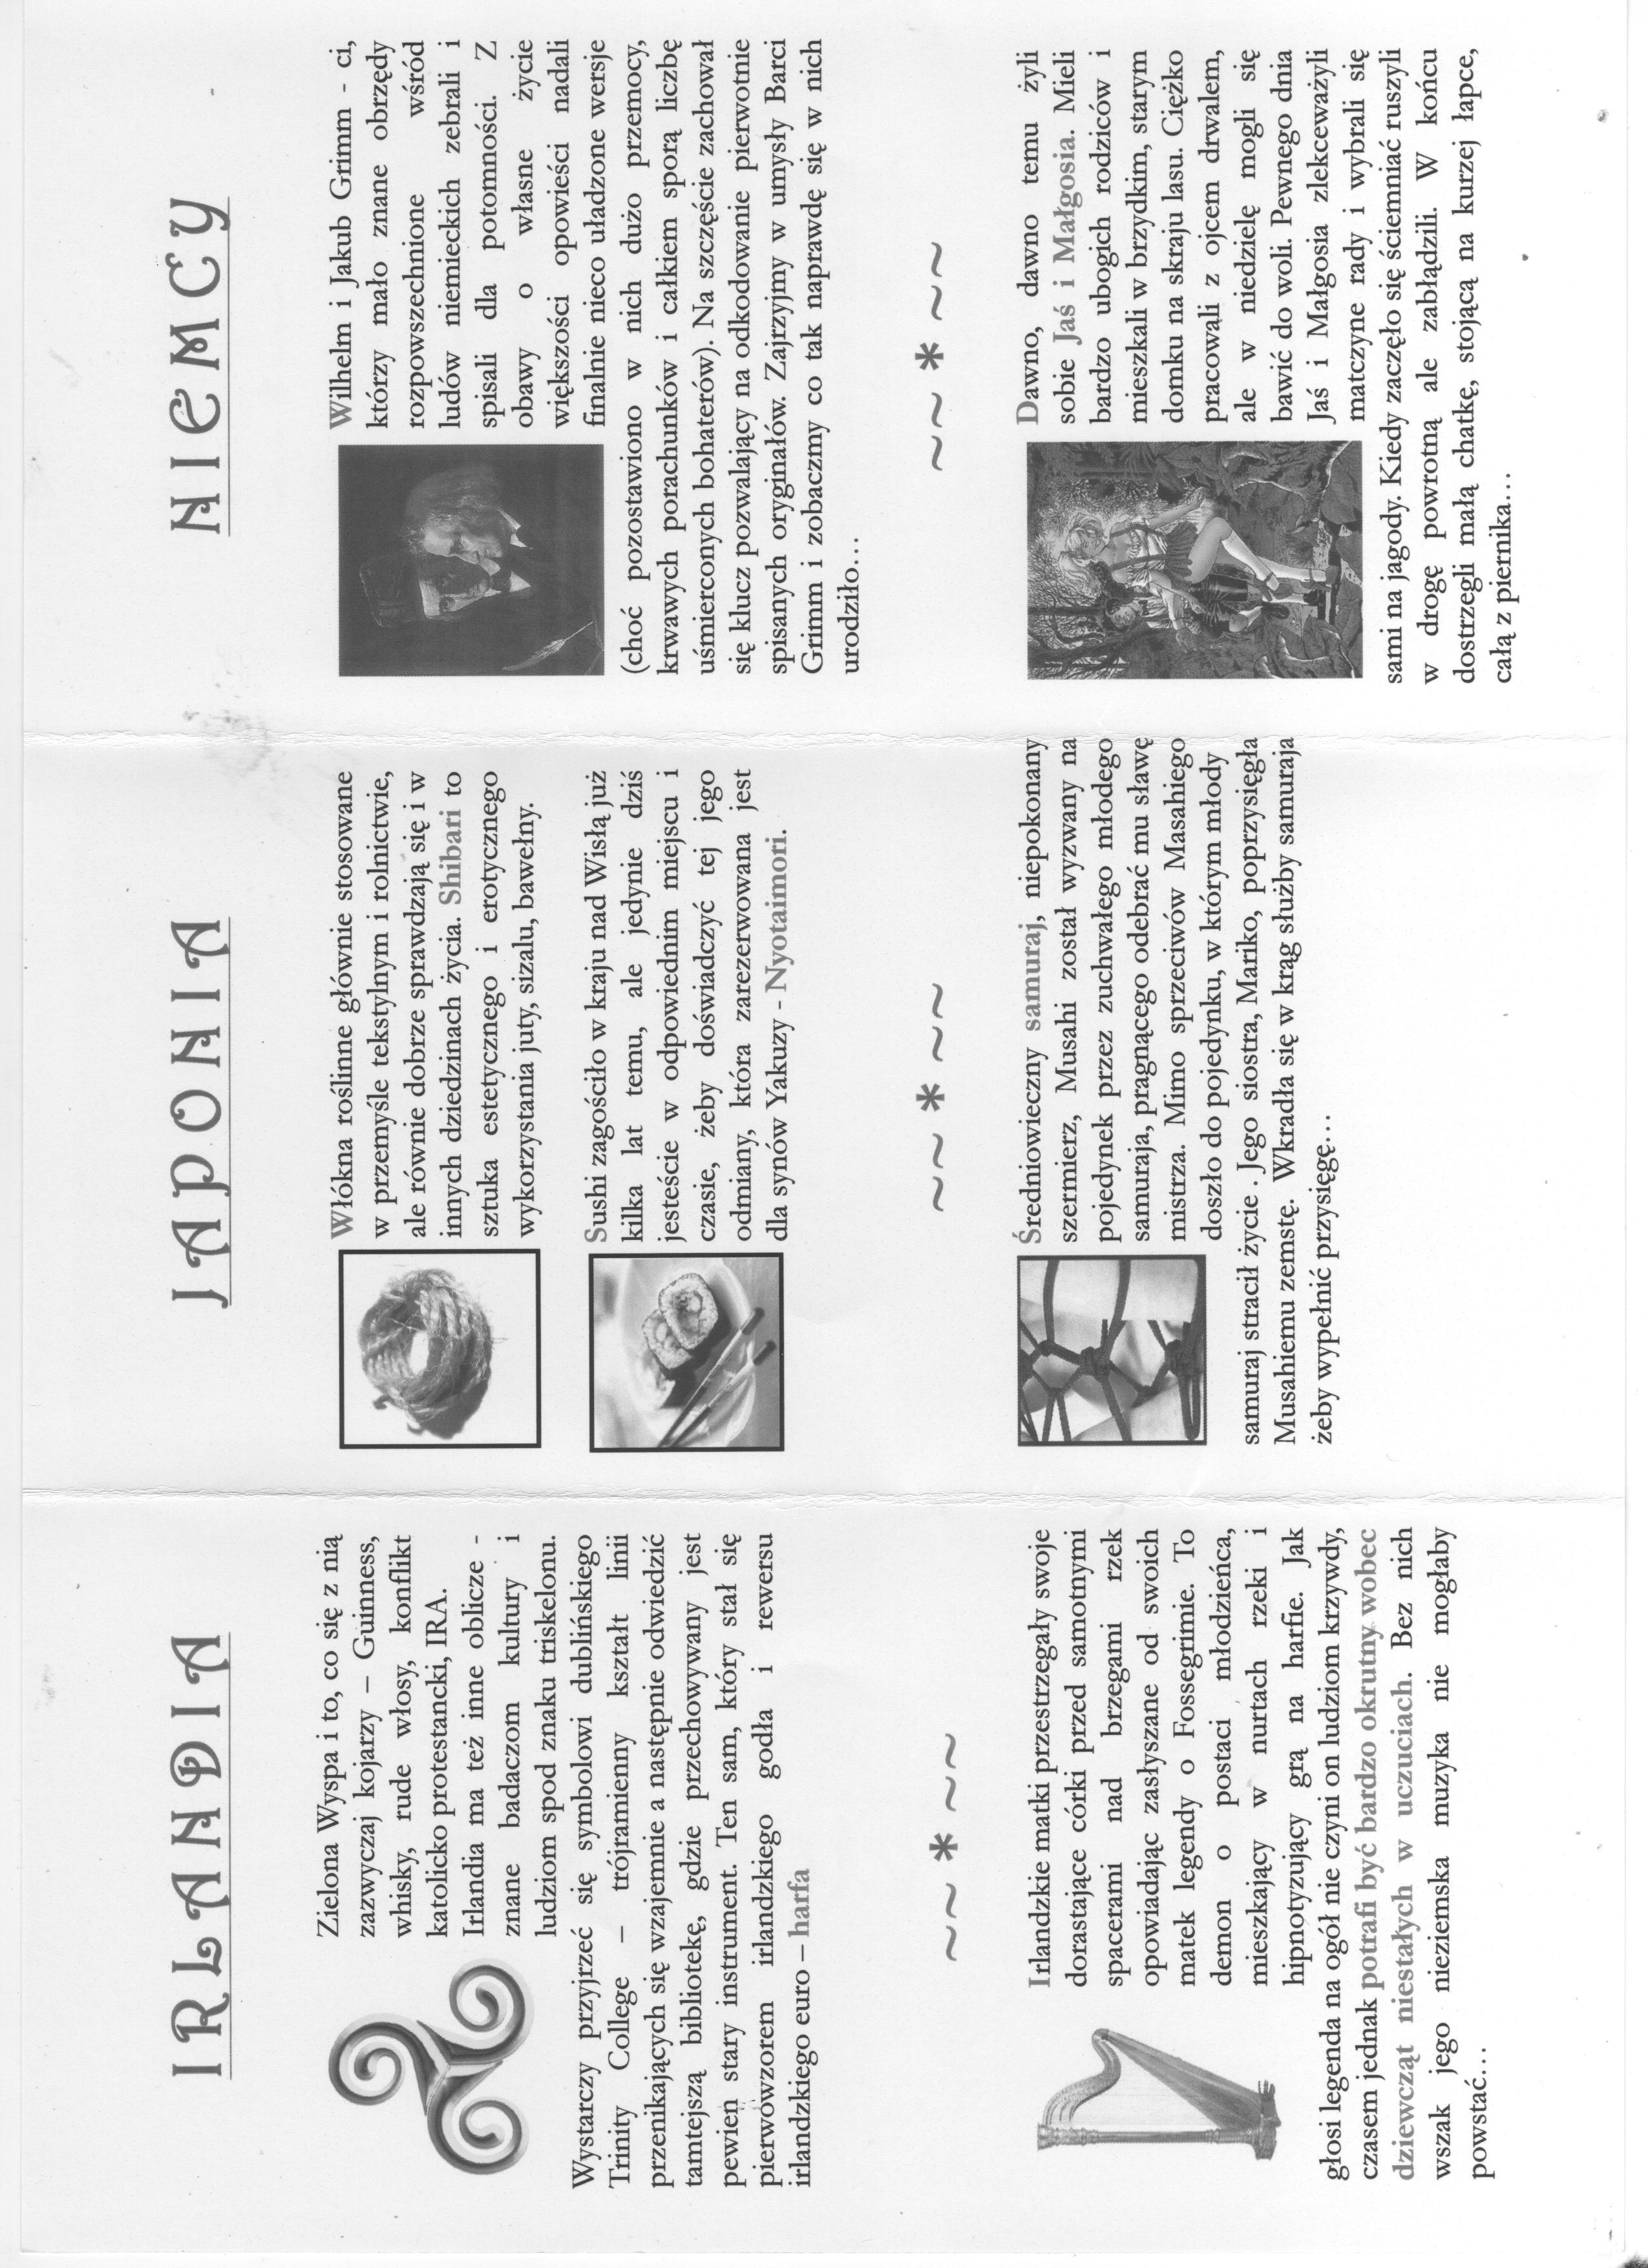 Fetyszoza folder str 2 001